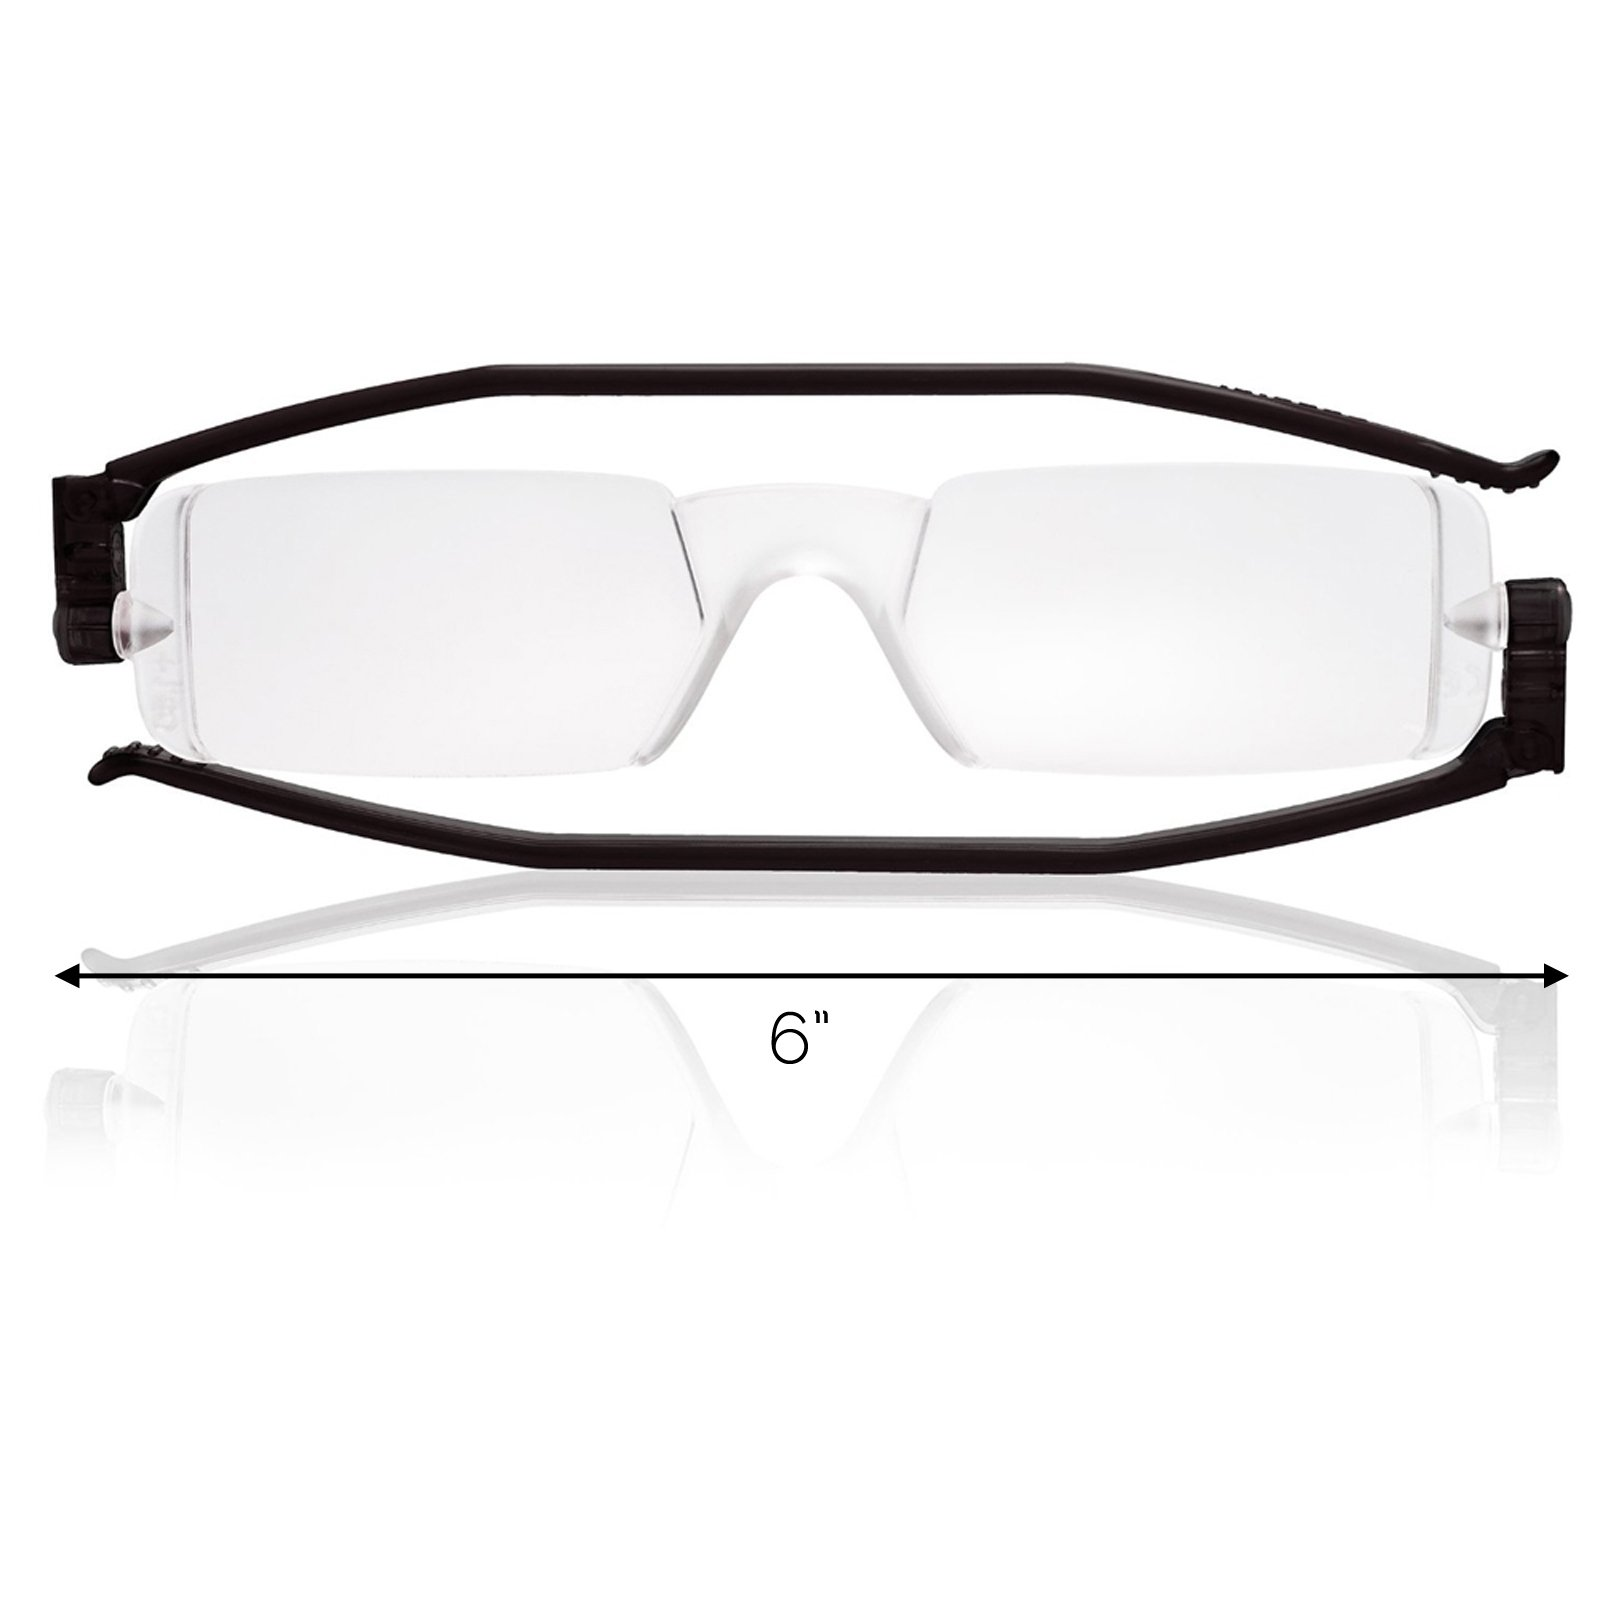 Reading Glasses Nannini Italy Vision Care Unisex Ultra Thin Readers - Black 2.0